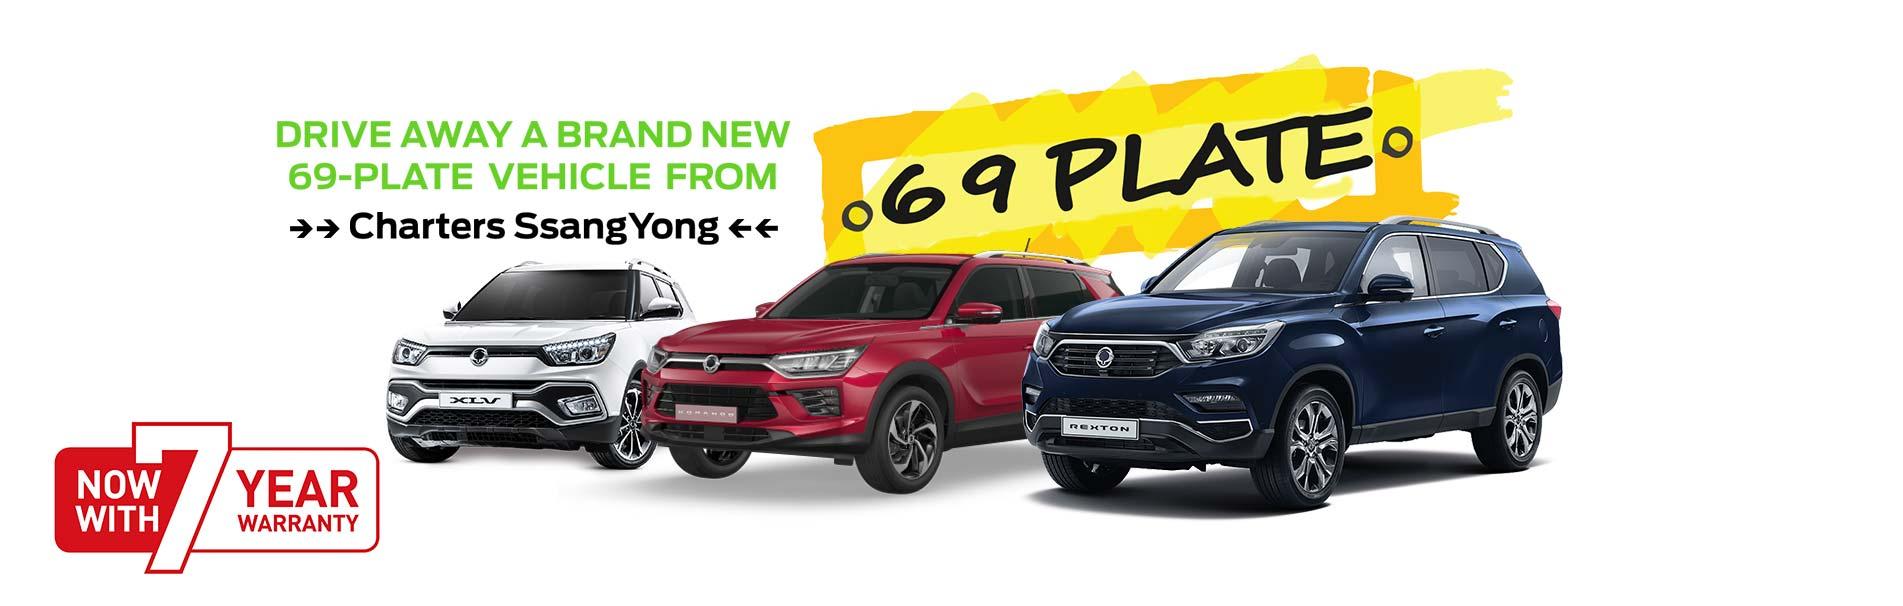 69-plate-ssangyong-cars-commercials-reading-berkshire-sli